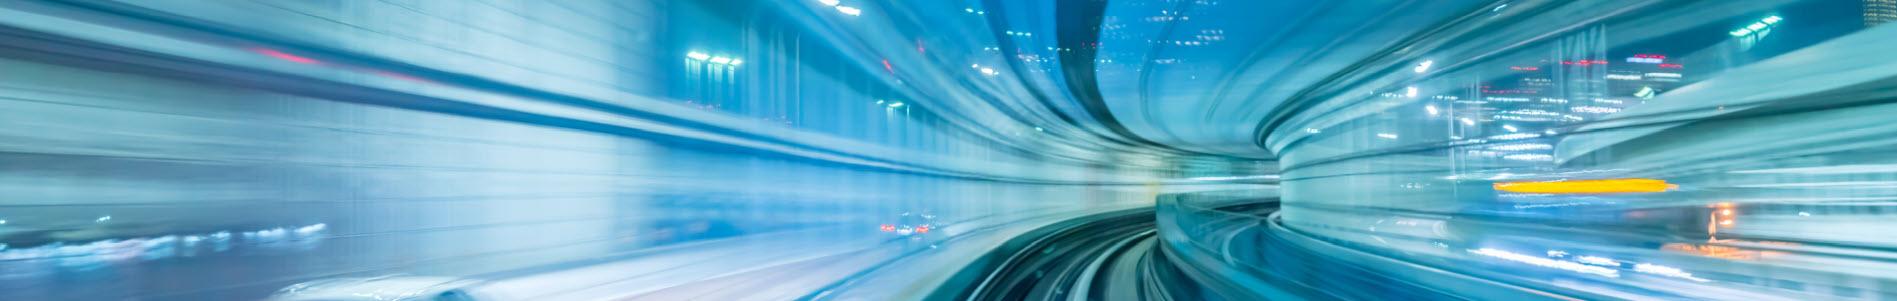 Change Managment & Digital Transformation